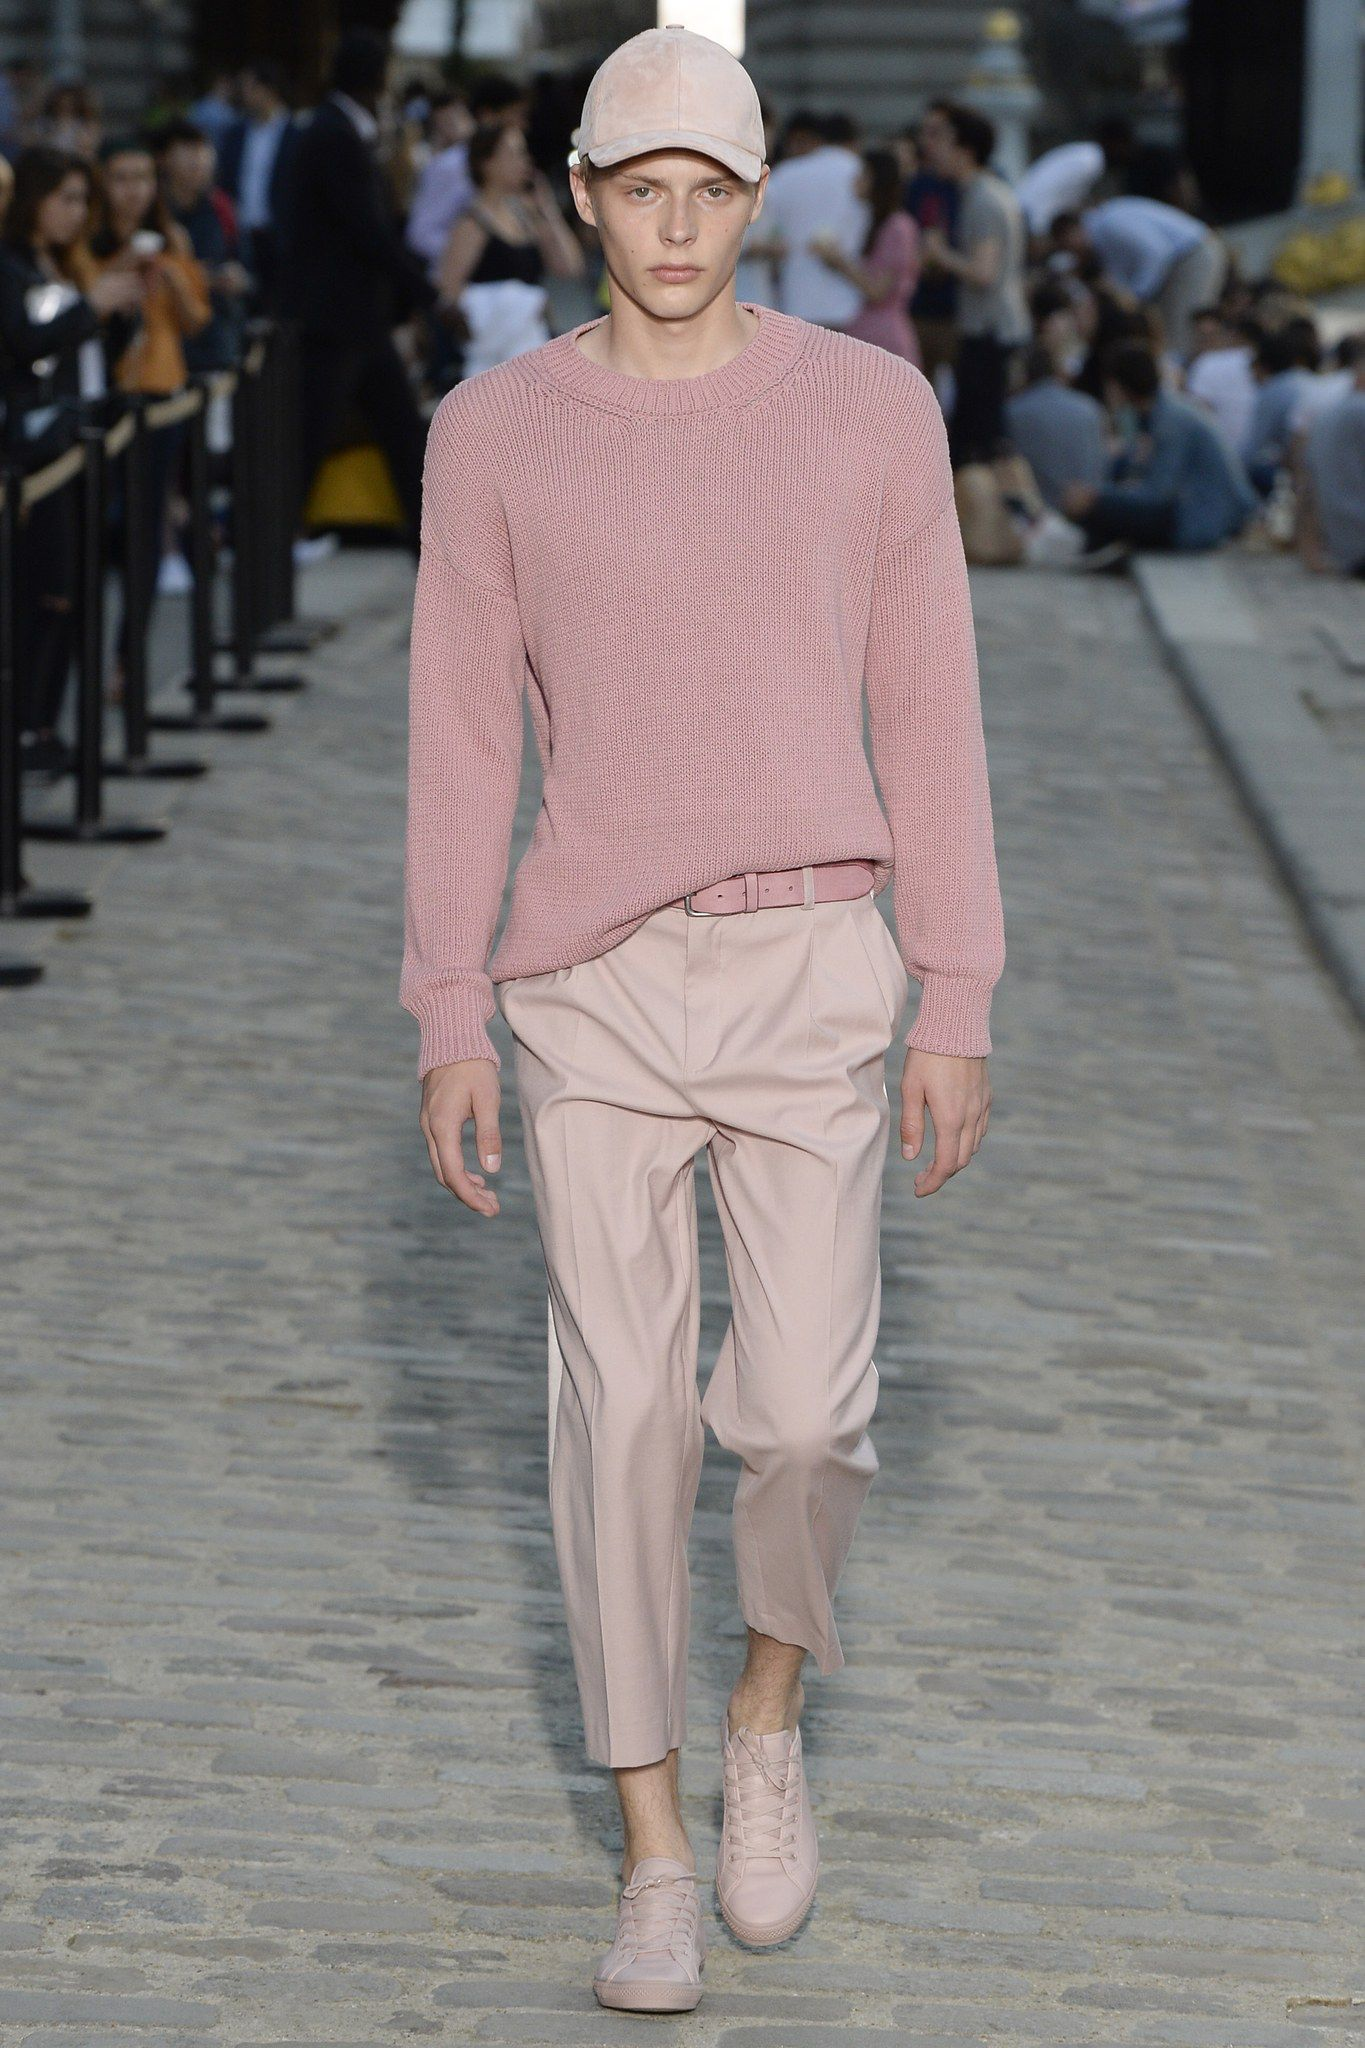 Paul u joe resort fashion show paul joe street style men and